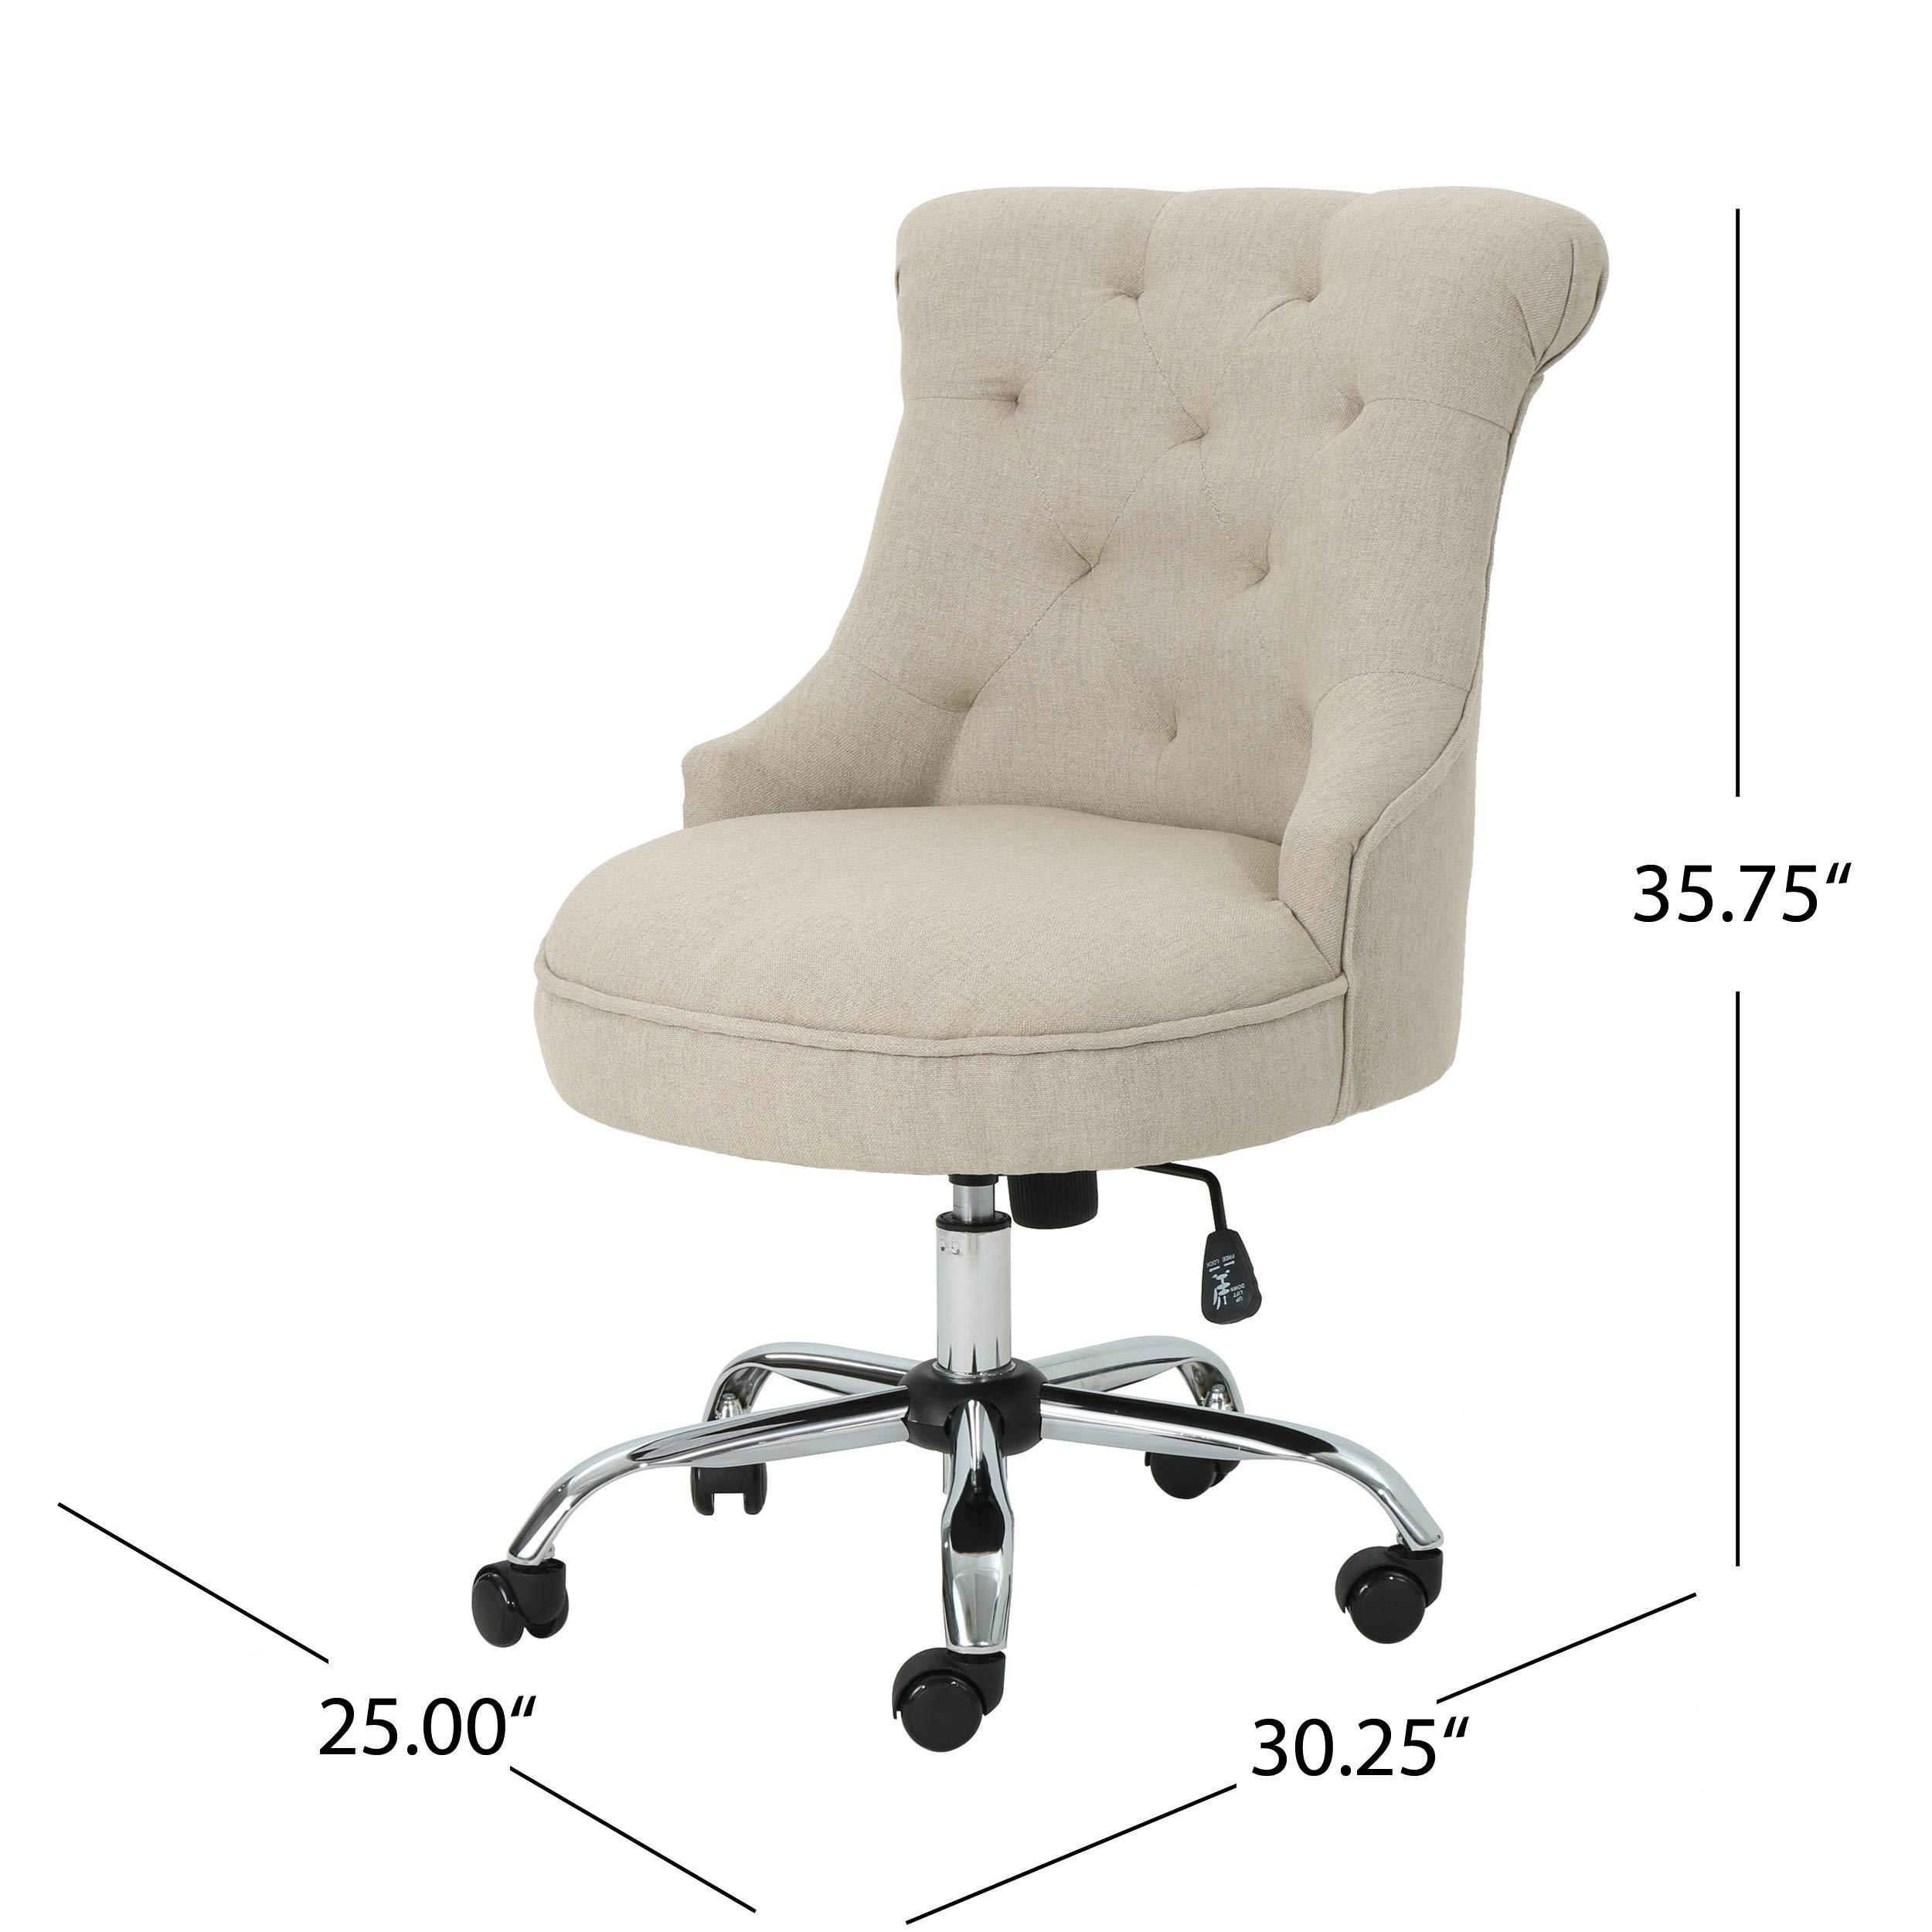 Christopher Knight Home 304964 Tyesha Desk Chair, Wheat + Chrome by Christopher Knight Home